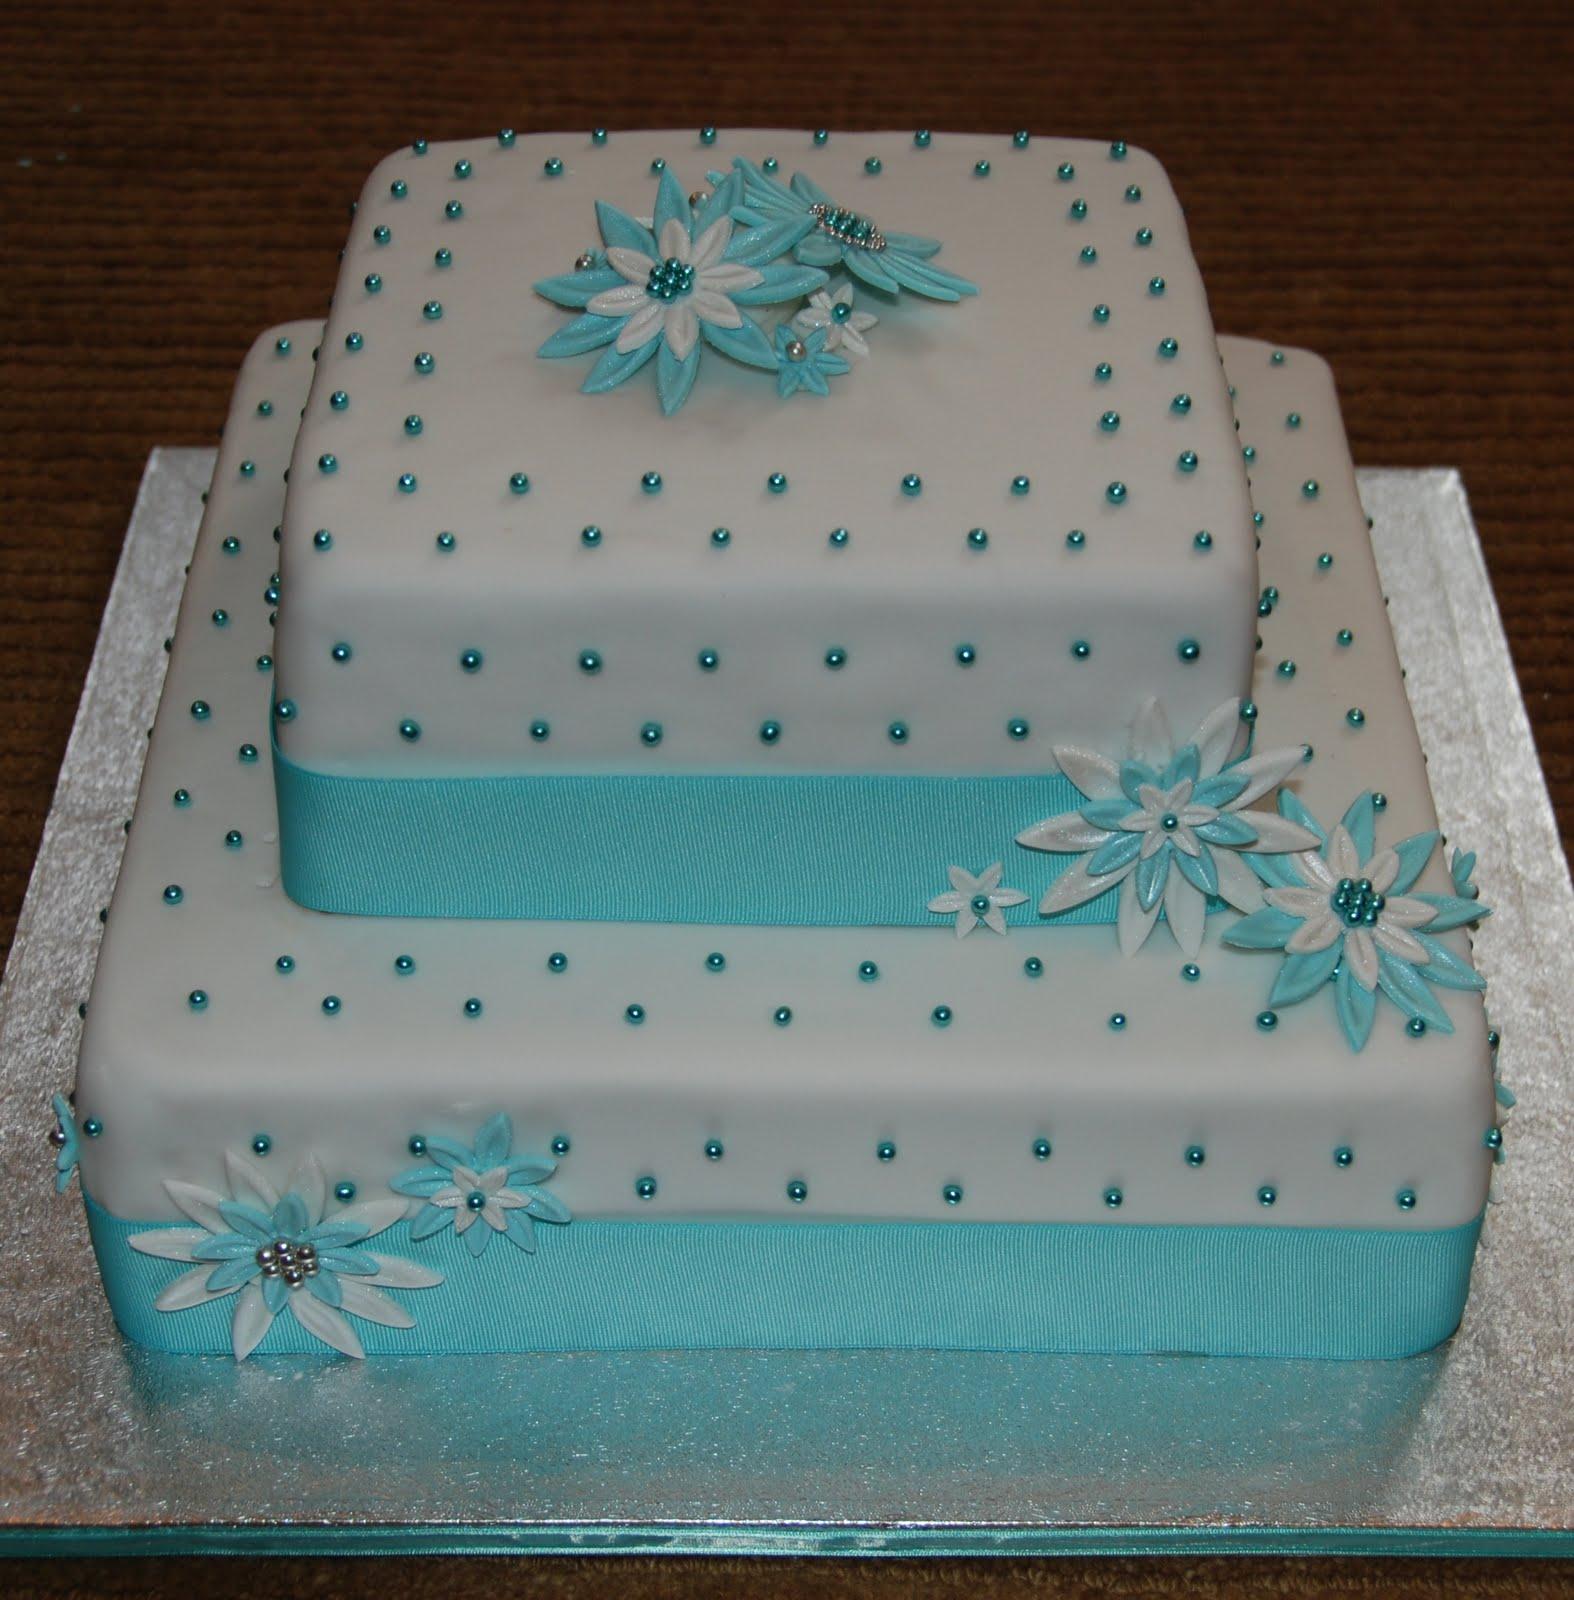 Tiffany Box Bridal Shower Cake - Tiffany Box Birthday Cake  Tiffany Bridal Shower Cakes